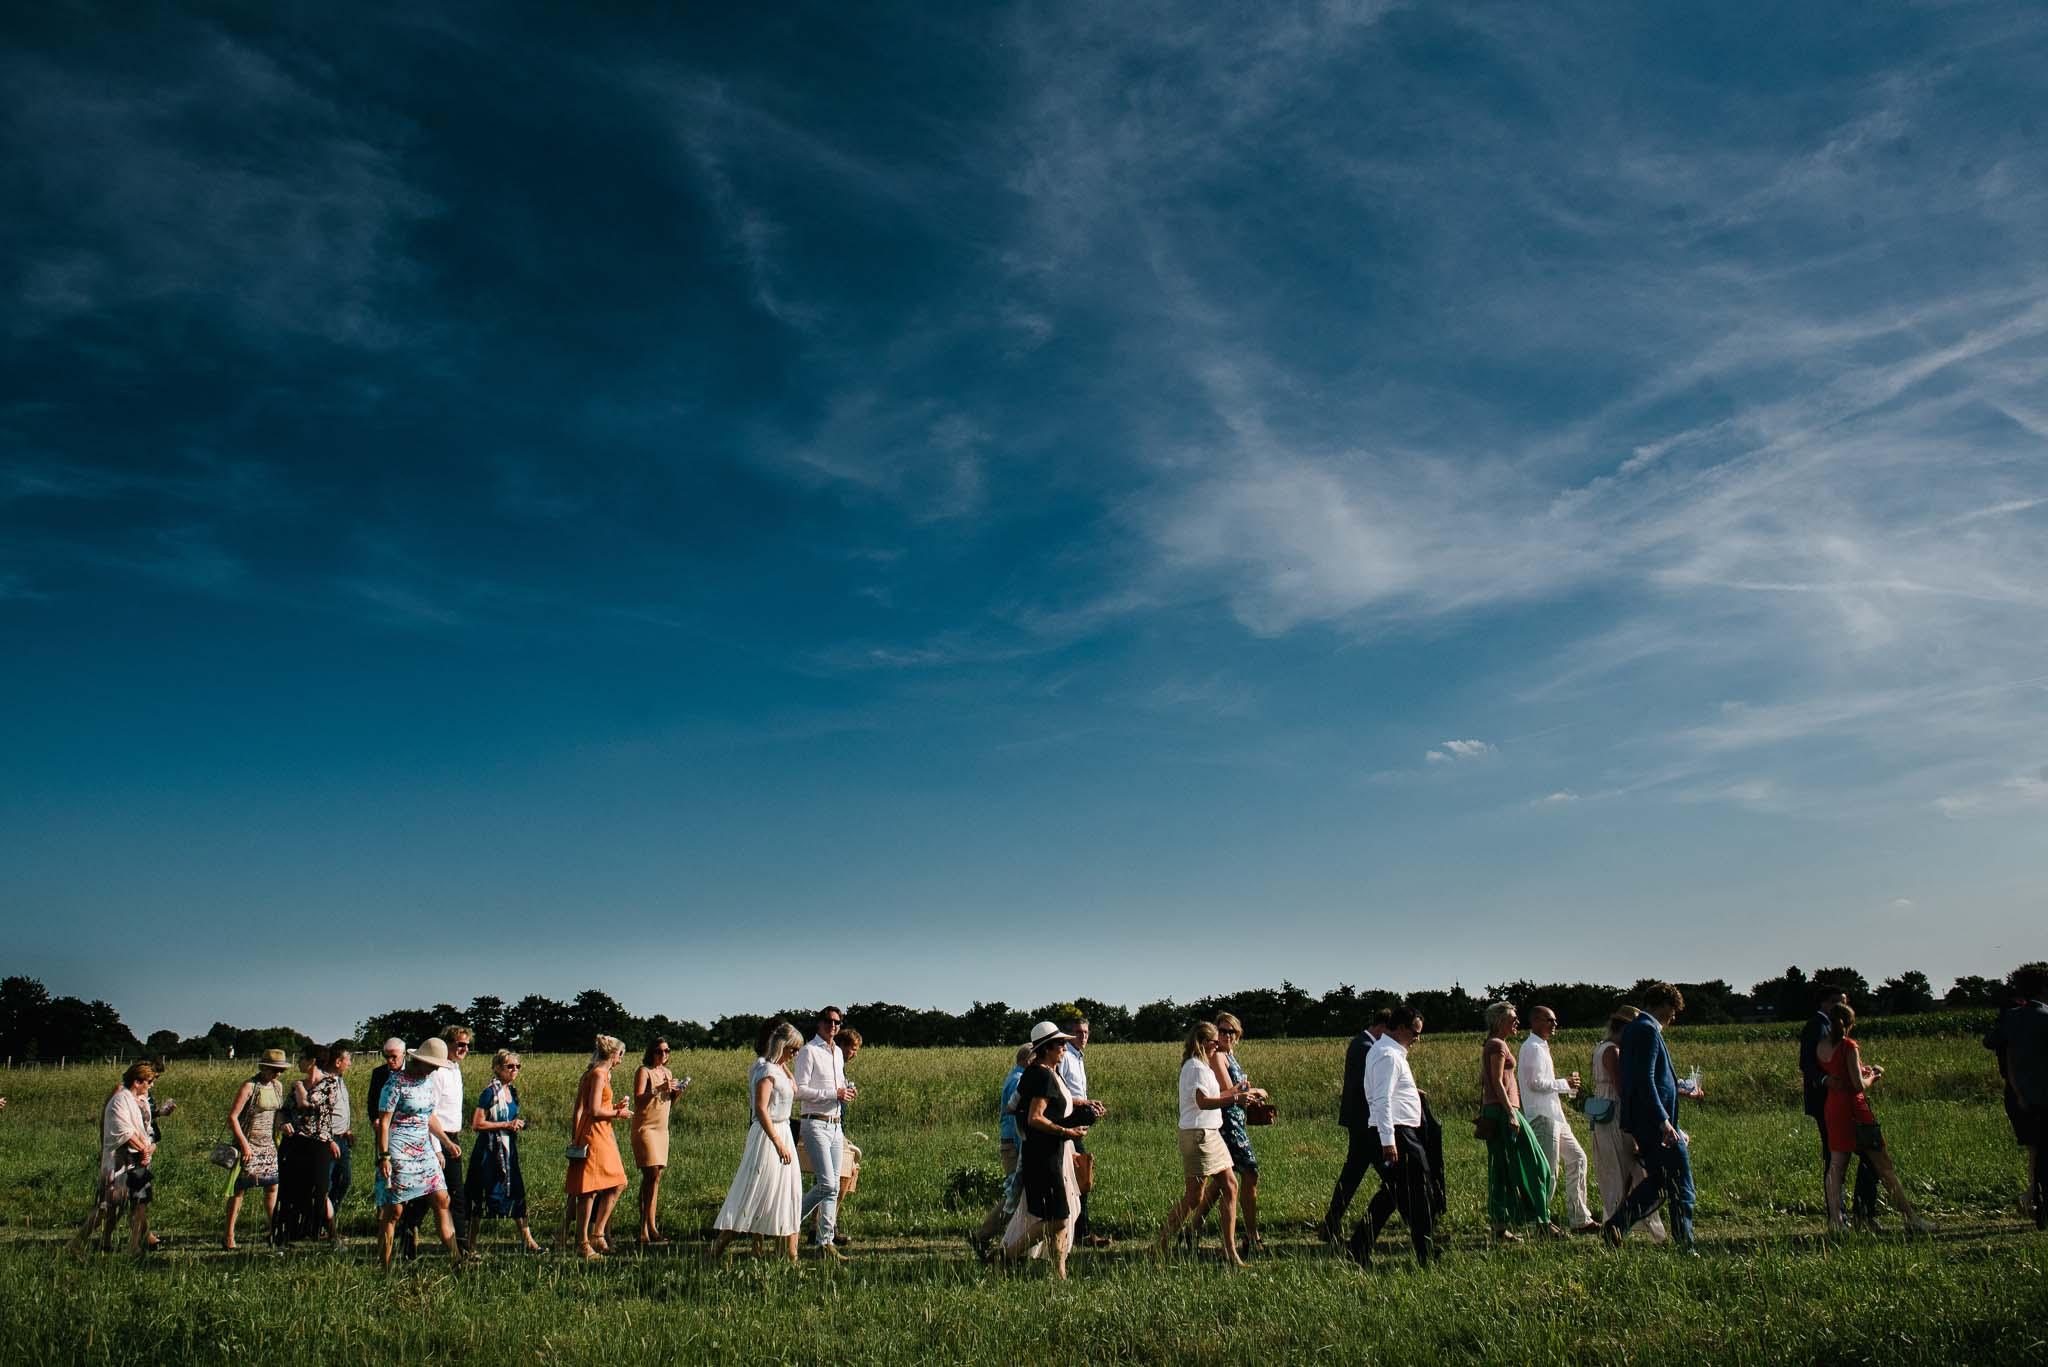 originele trouwfoto's spontaan journalistiek buiten trouwen weiland